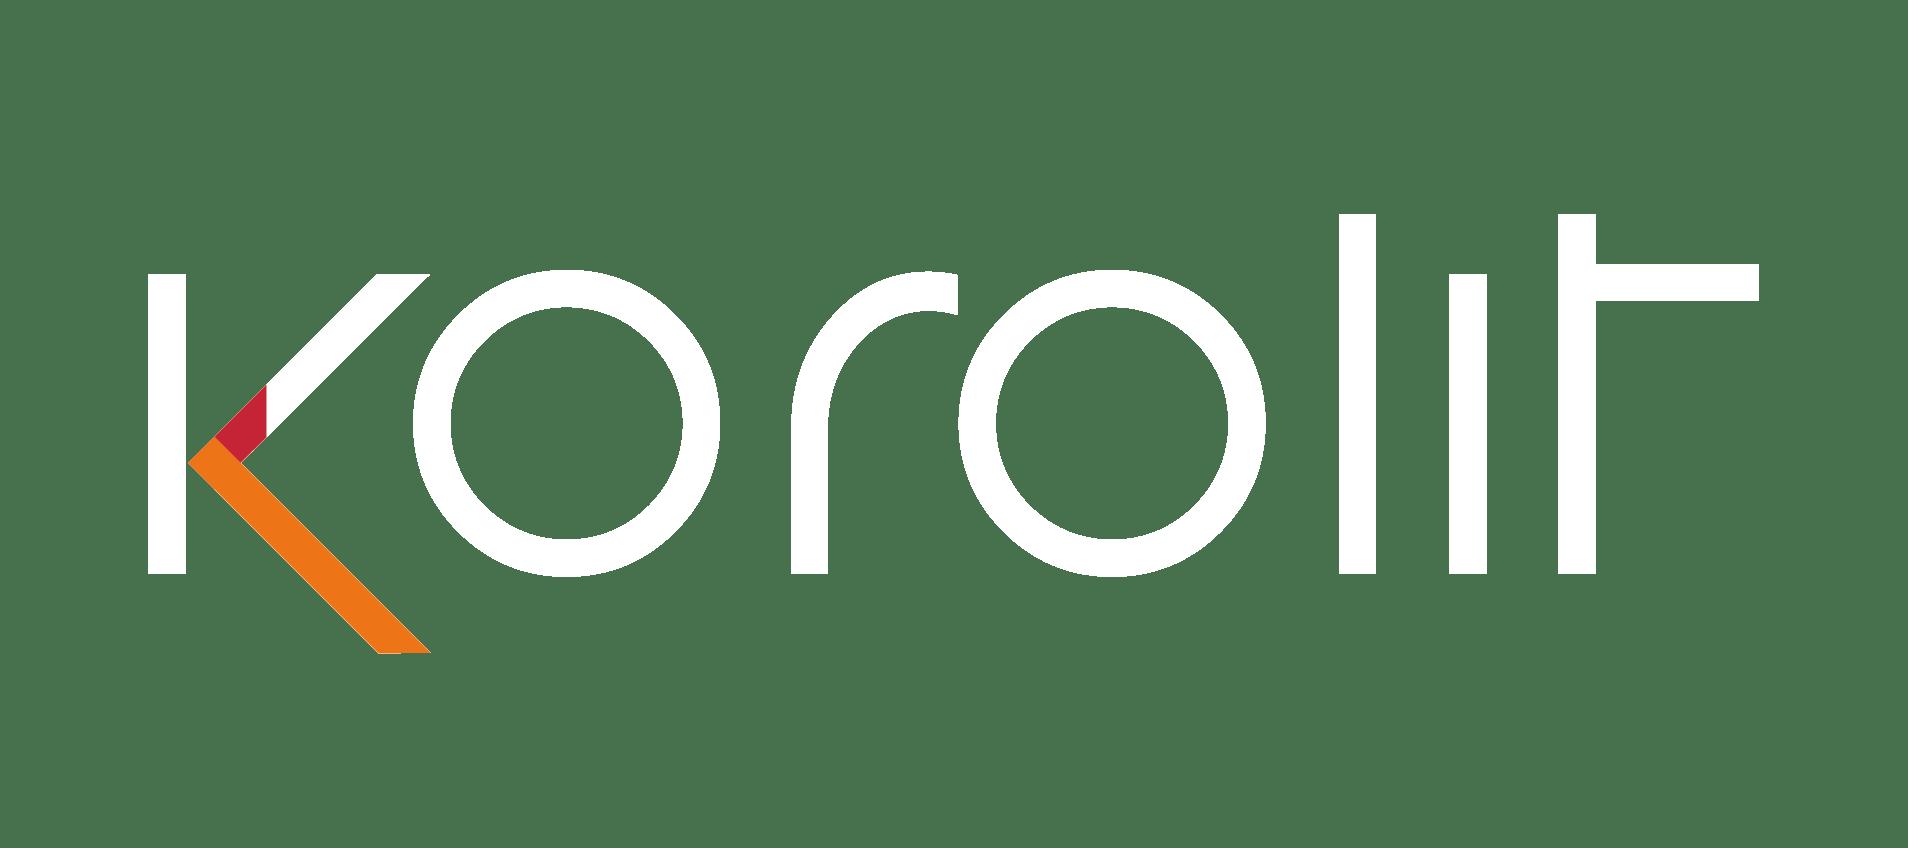 Korolit